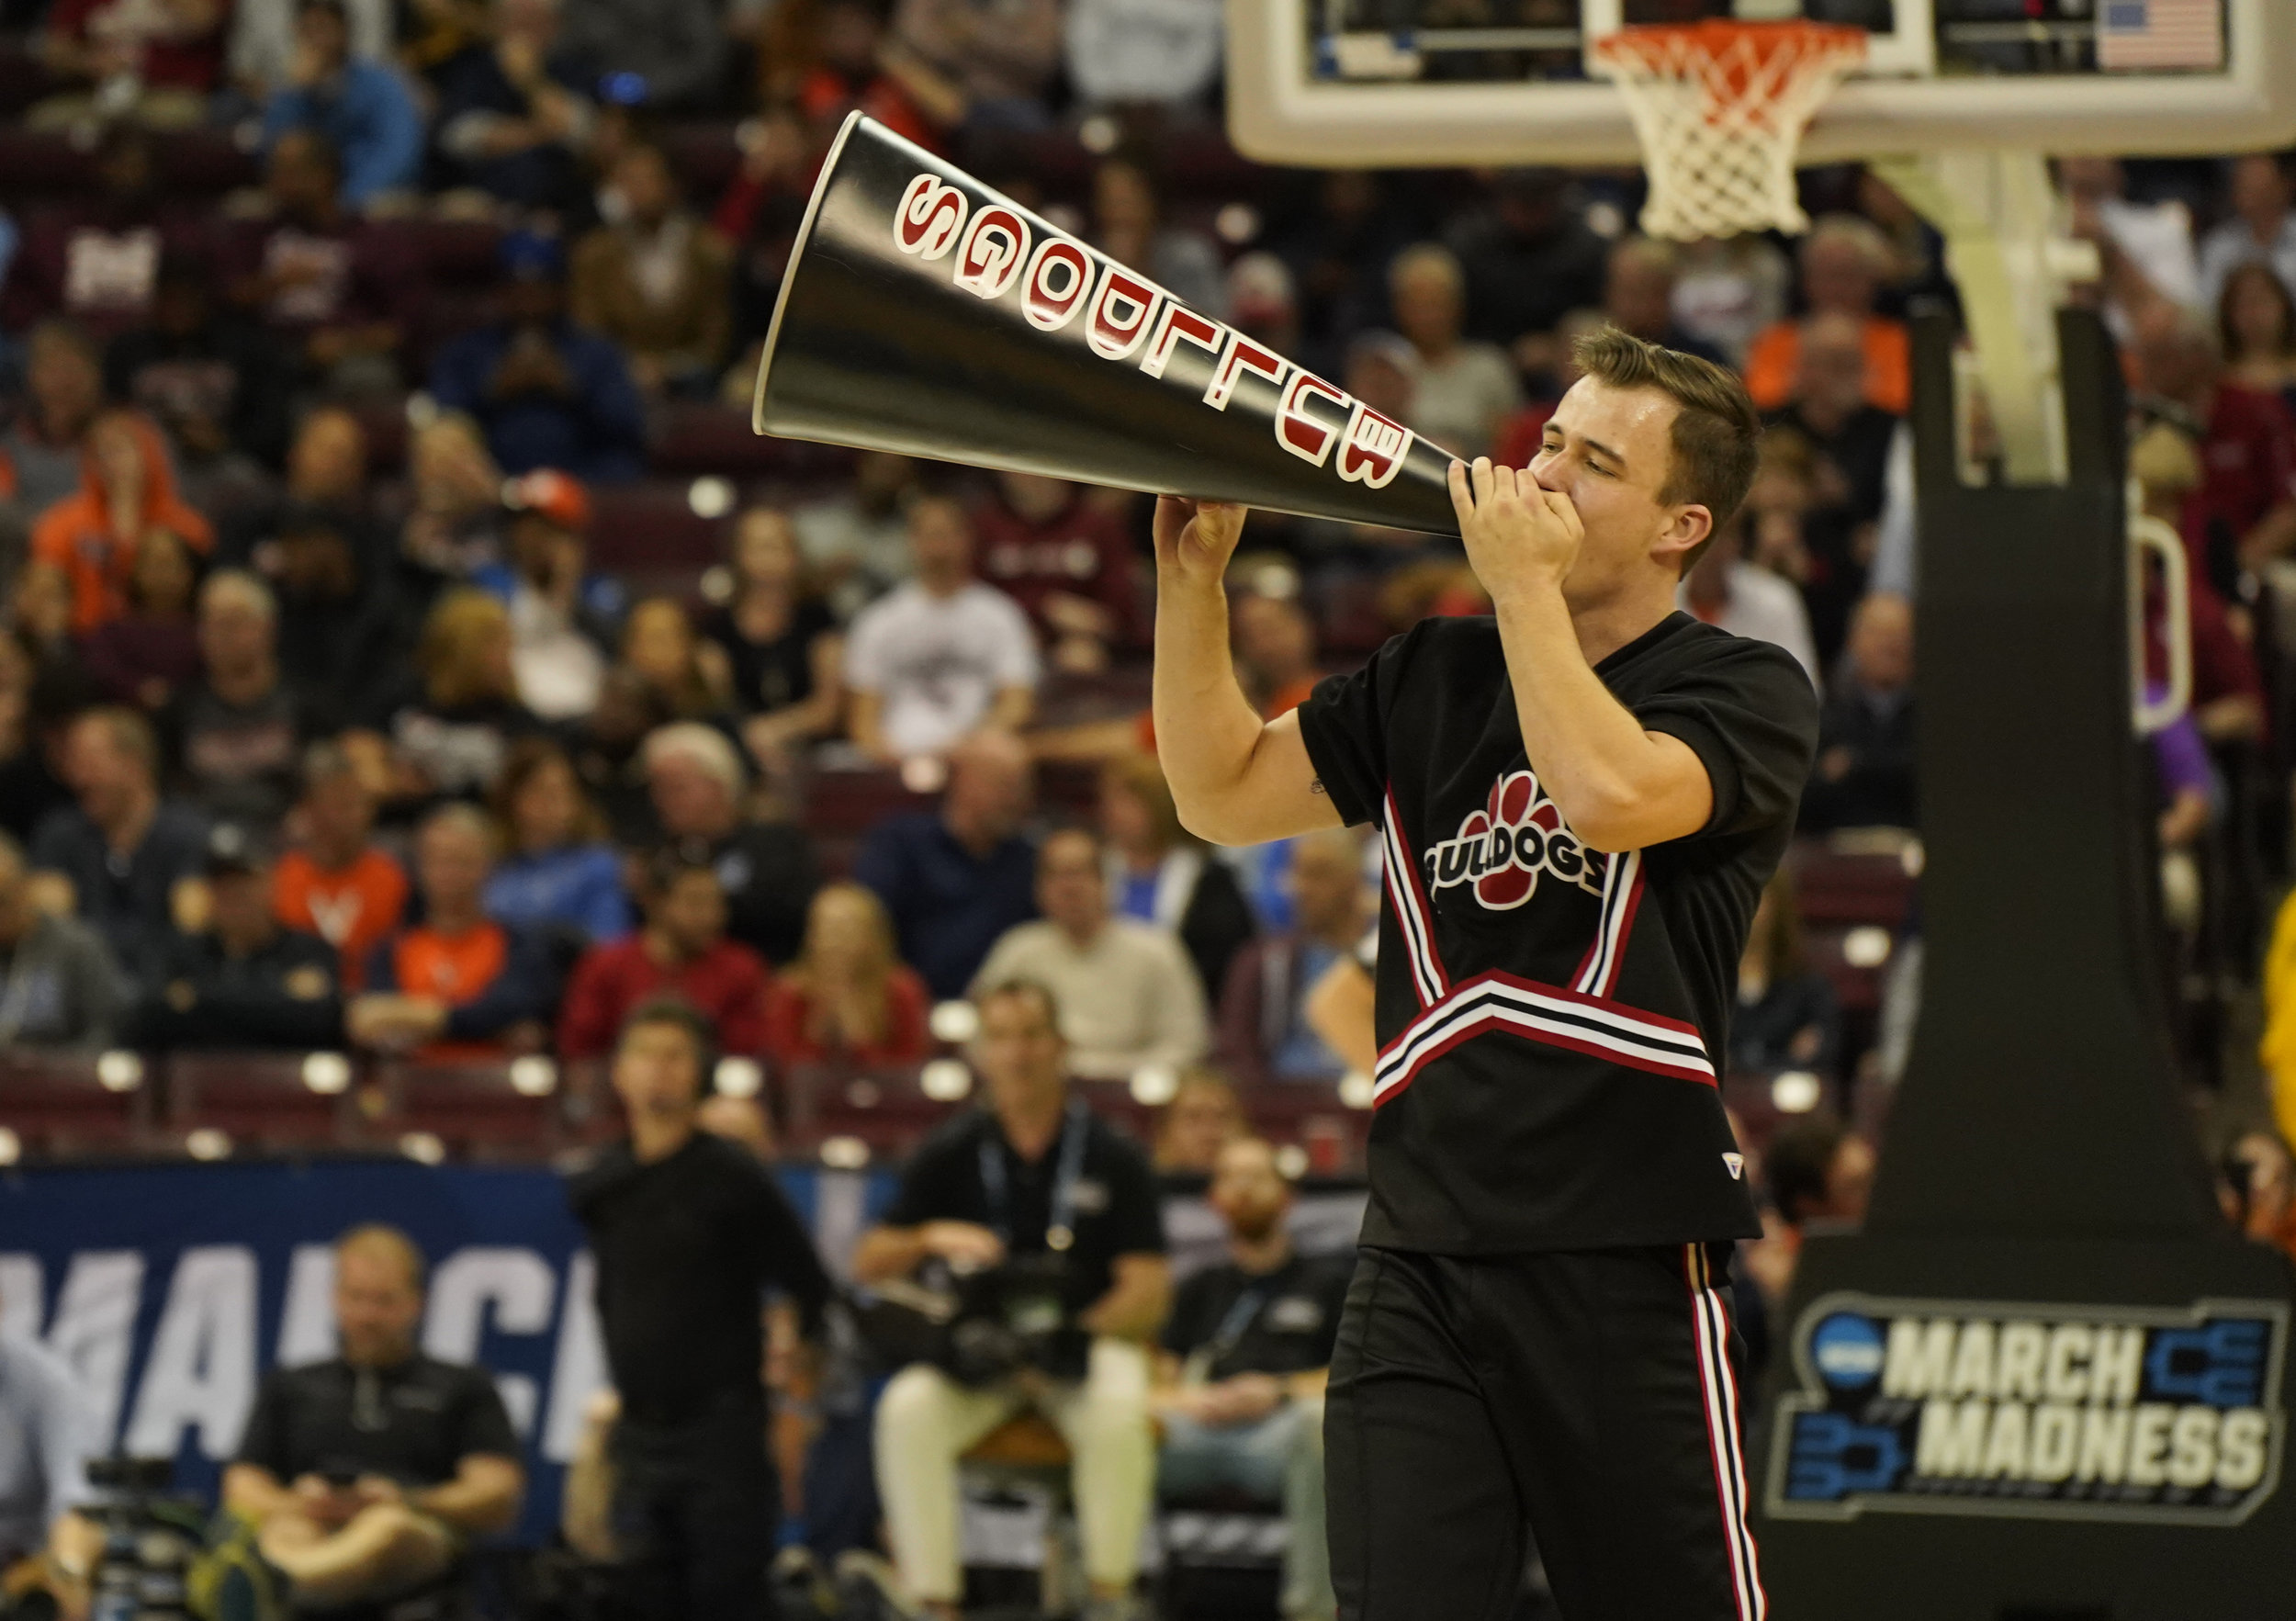 Daniel cheering during the Gardner-Webb vs. UVA March Madness game.